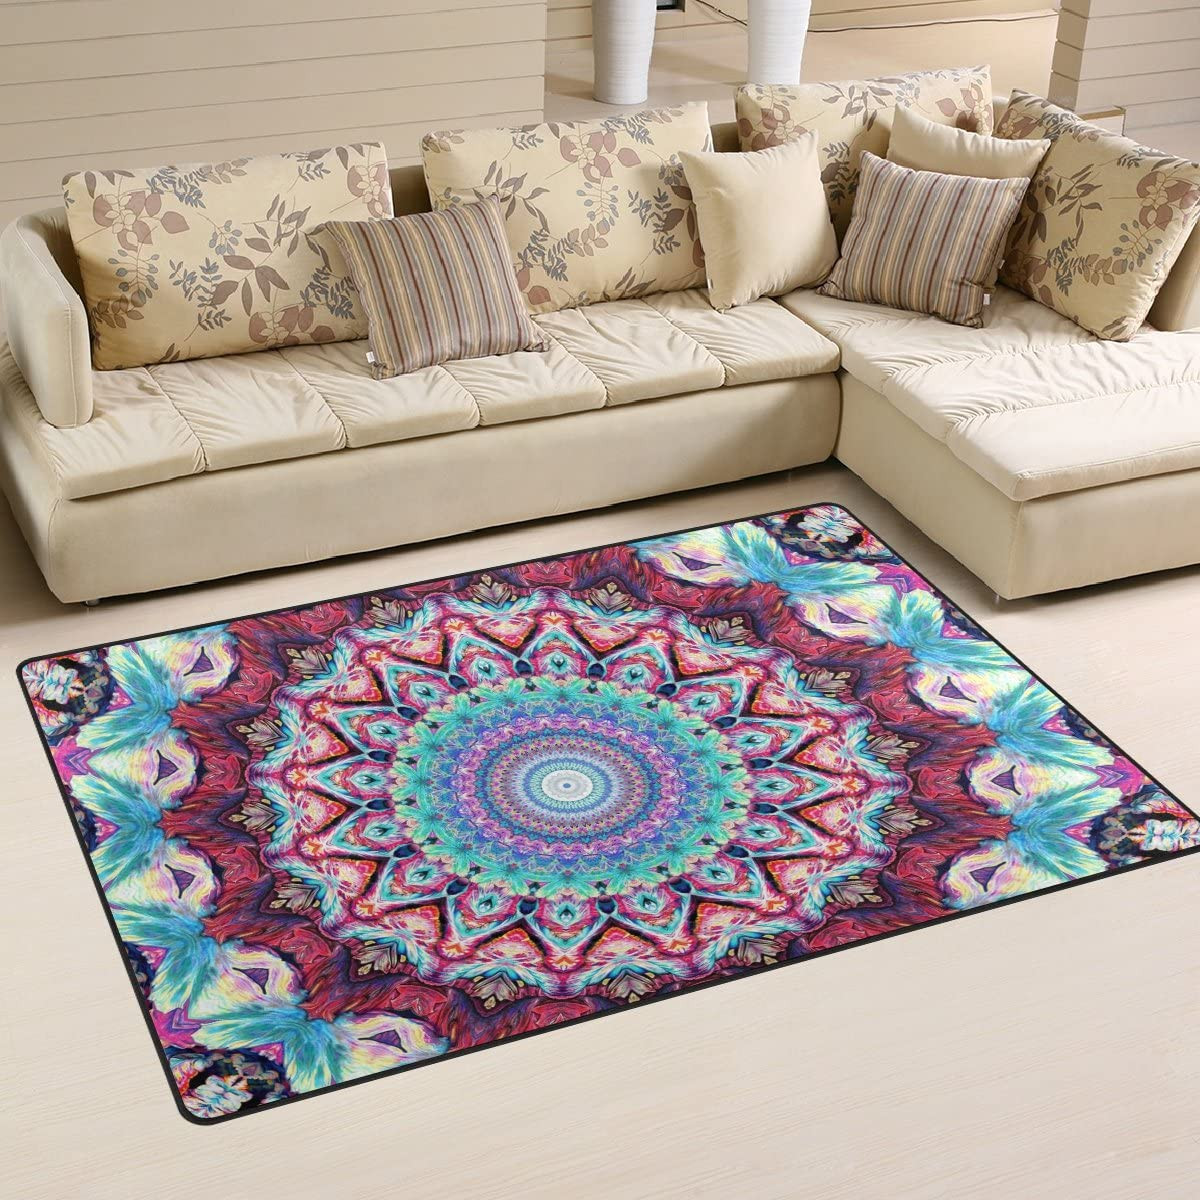 Sunlome Hippie Mandala Bohemian Psychedelic Area Rug Rugs Non-Slip Indoor Outdoor Floor Mat Doormats for Home Decor 60 x 39 inches